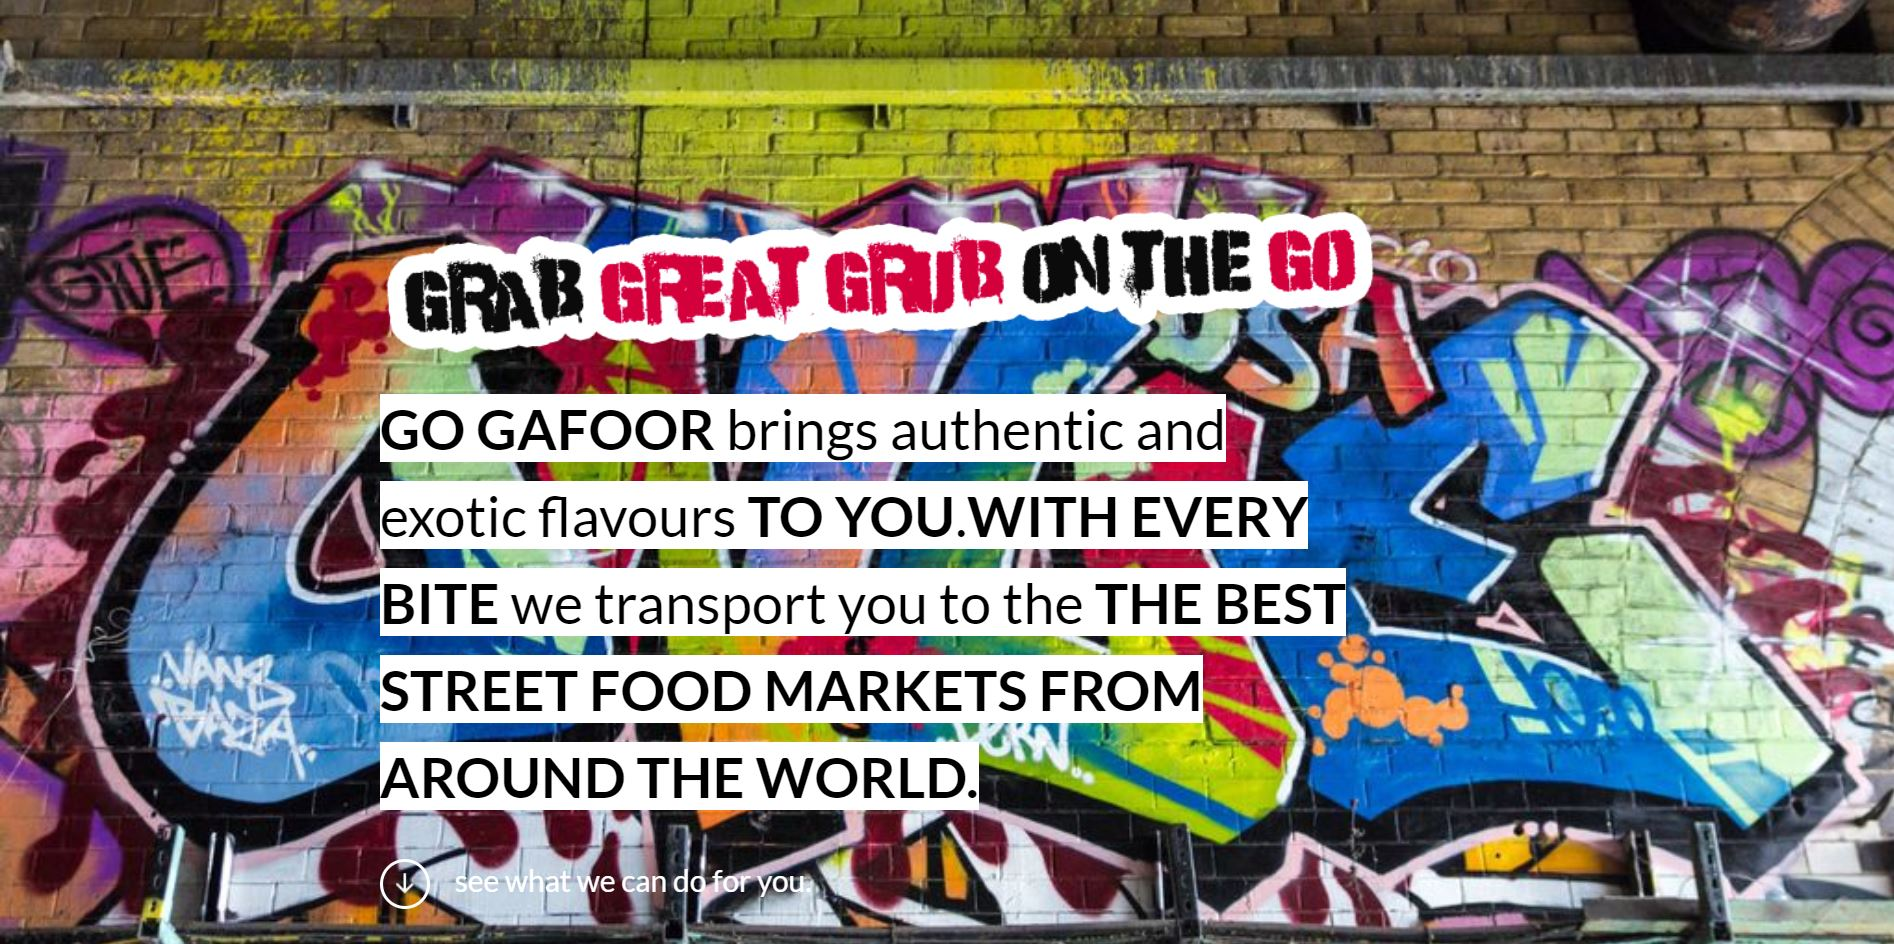 GREATGRUB website